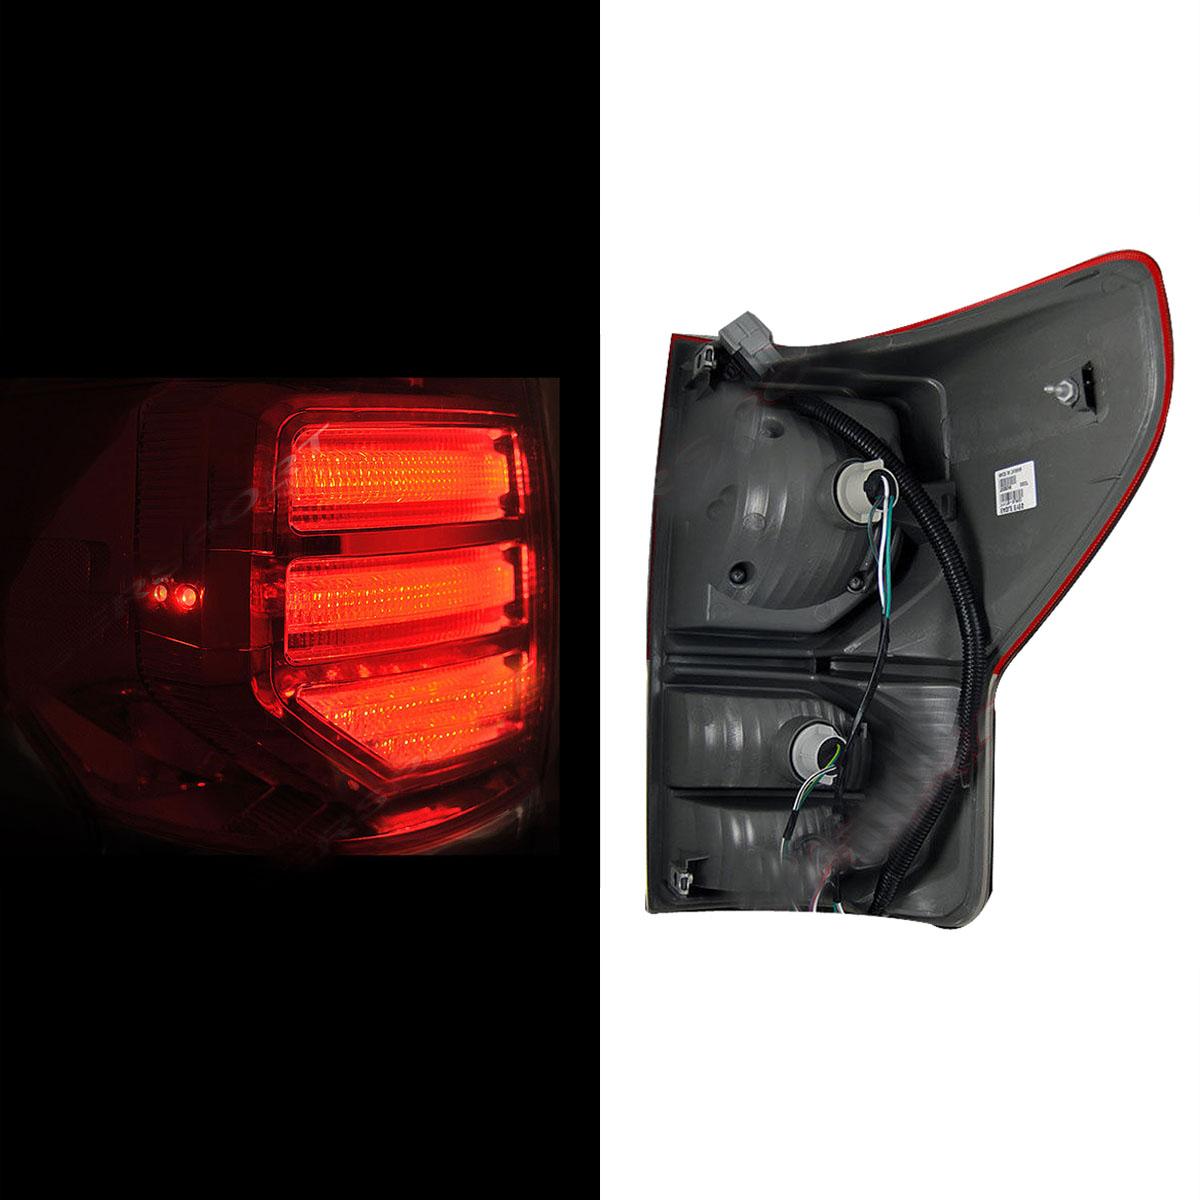 toyota truck tail light wiring toyota tundra tail light wiring 2007 2008 2009 2010 2011 2012 2013 toyota tundra led red ...